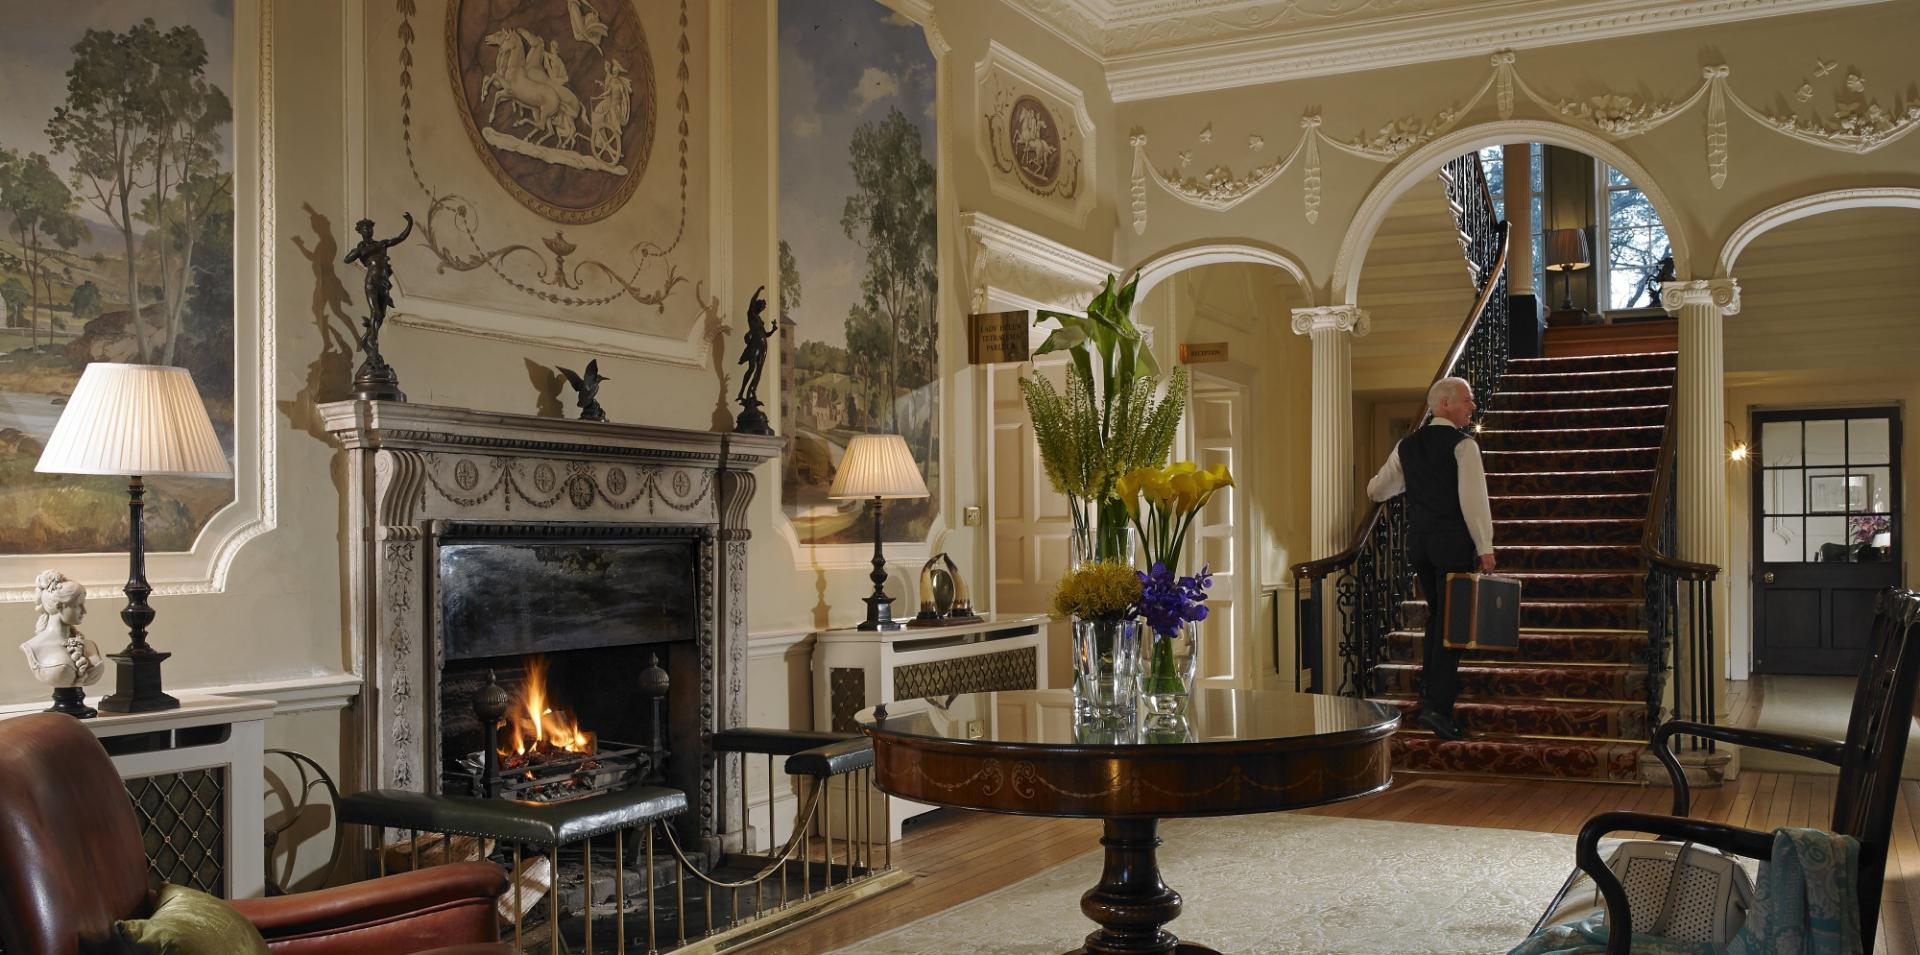 Lobby of Manor House